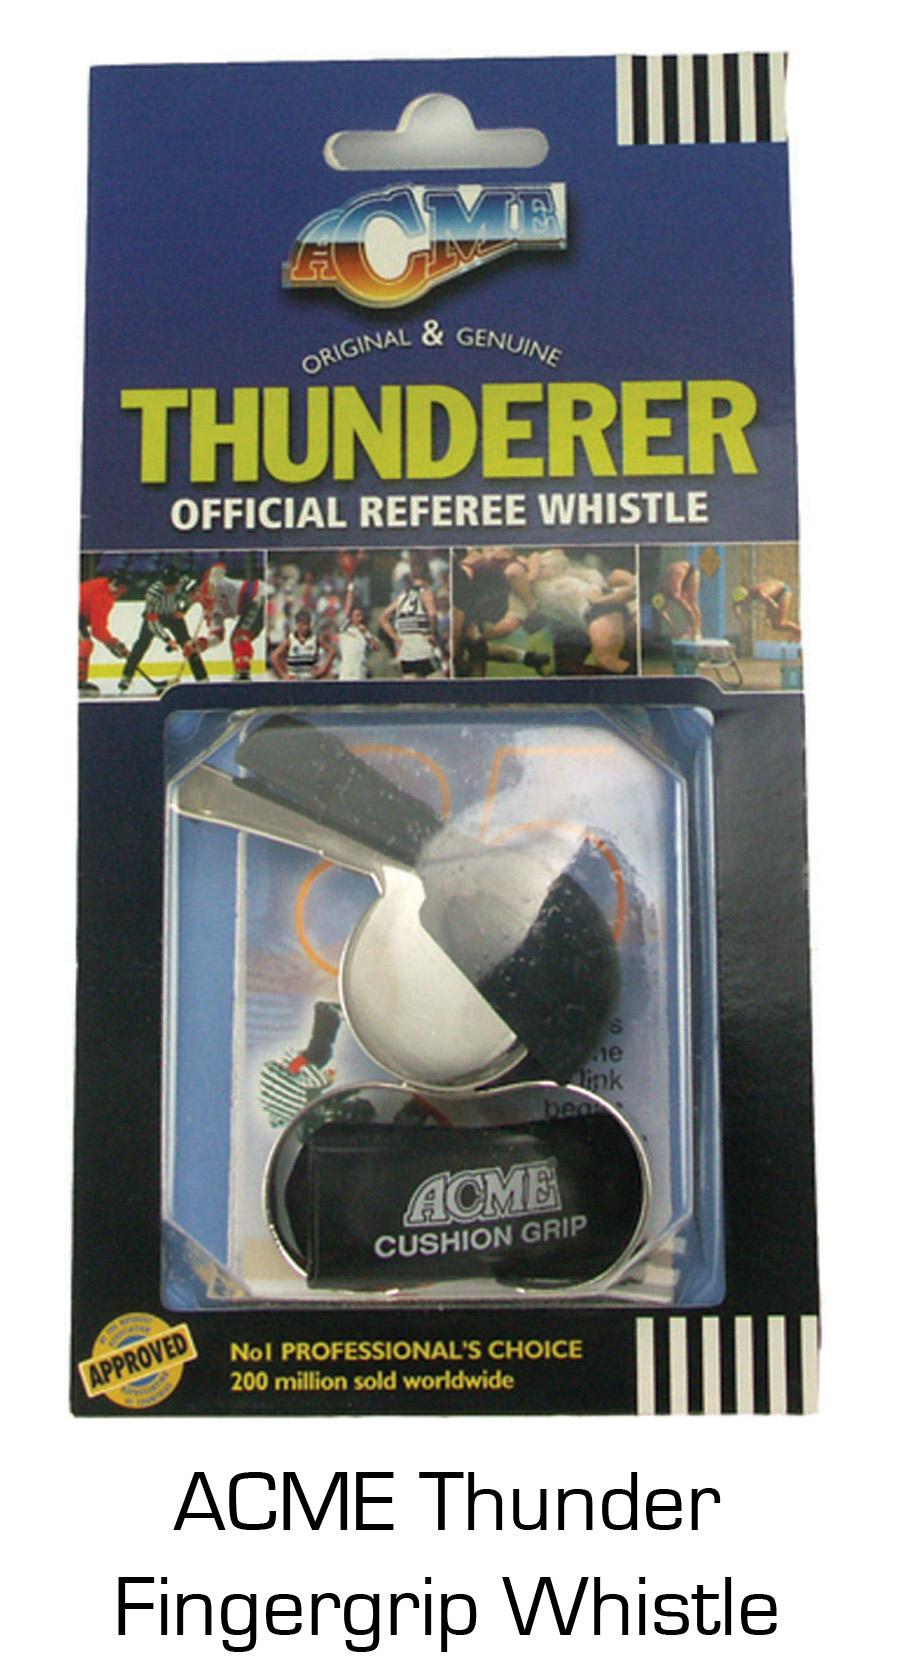 ACME Thunder Fingergrip Whistle